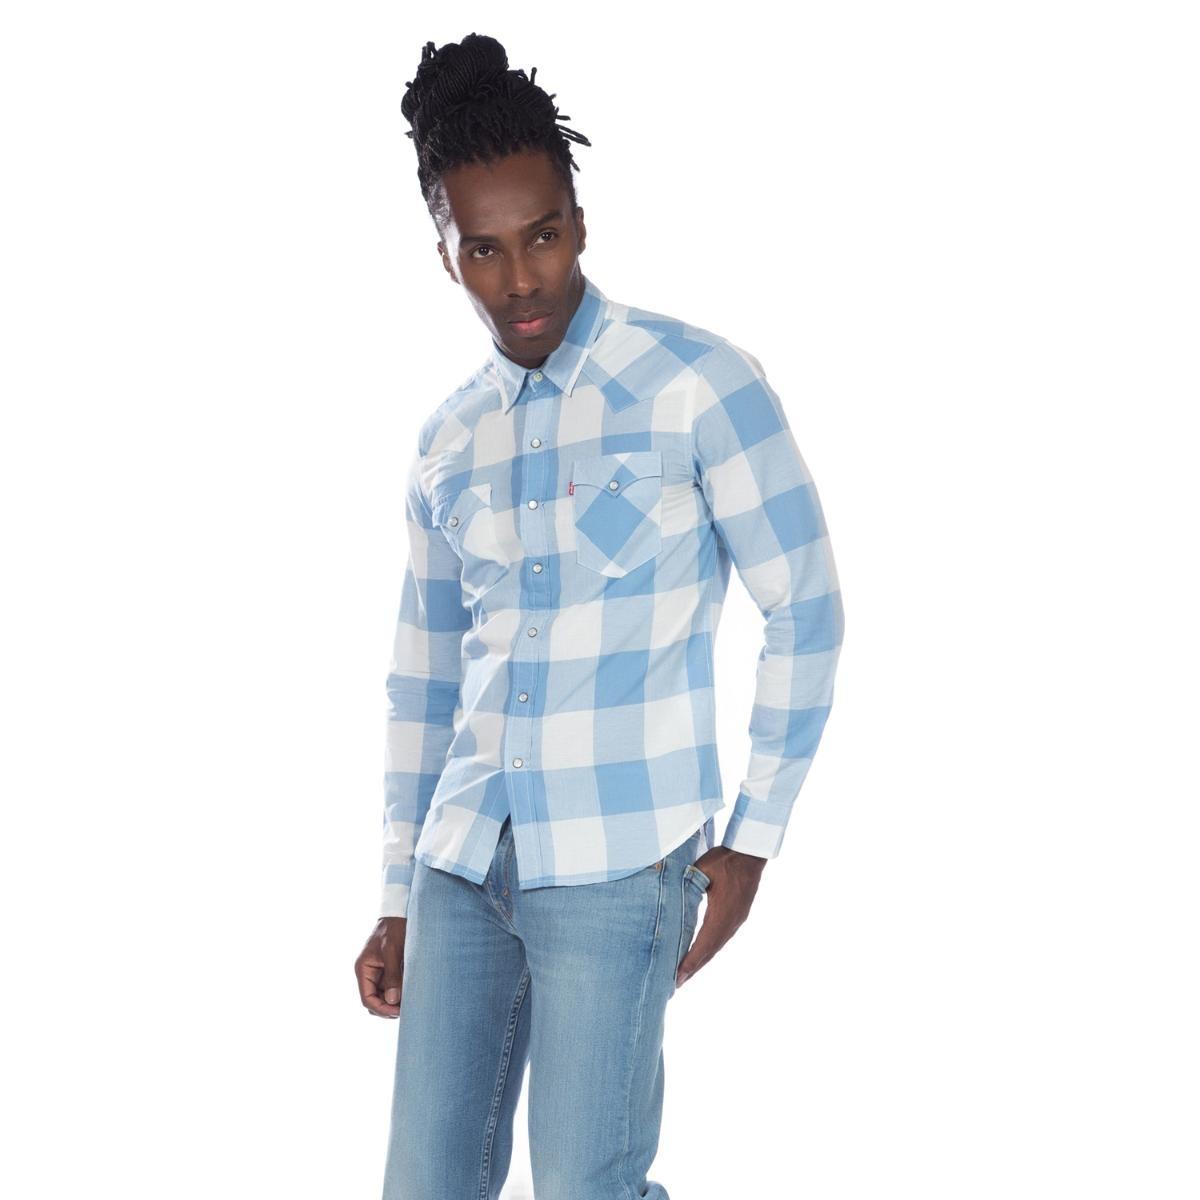 camisa levis masculino classic western xadrez azul claro. Carregando zoom. 11465a61773